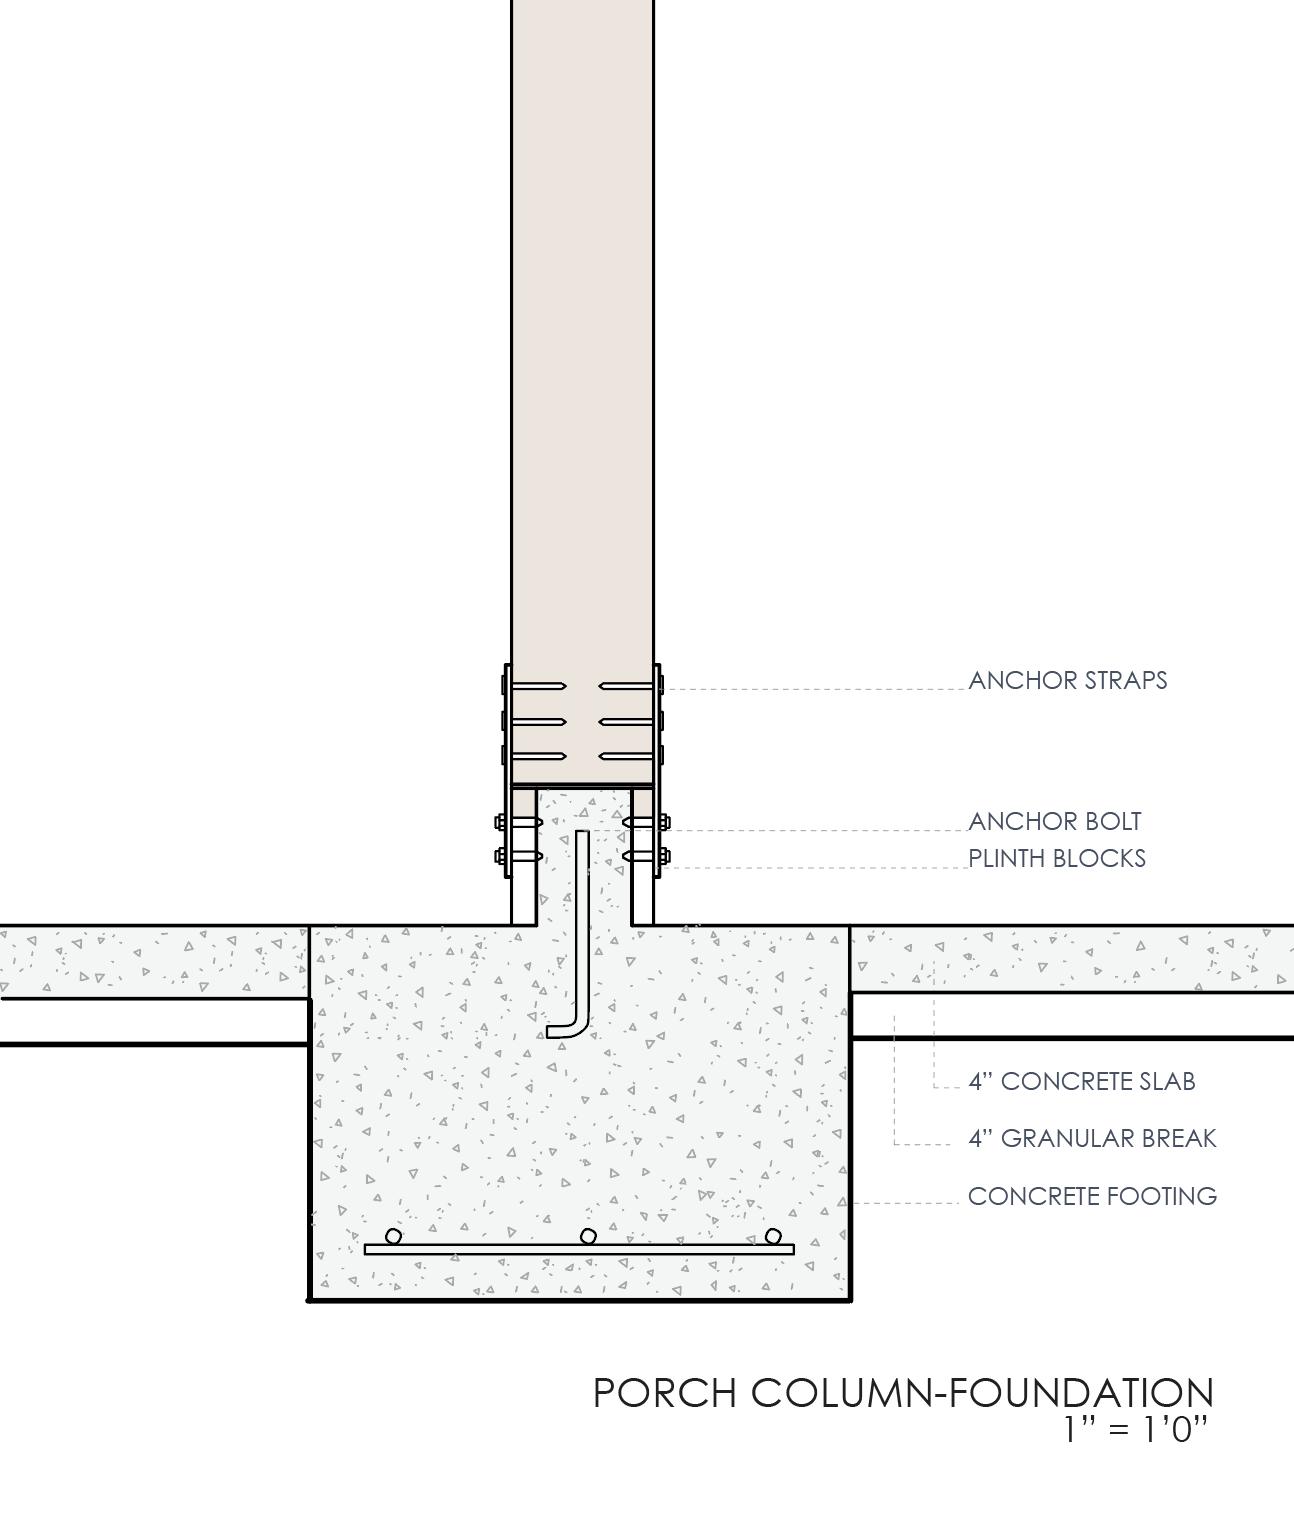 porch column foundation detail porch house houston s fifth ward